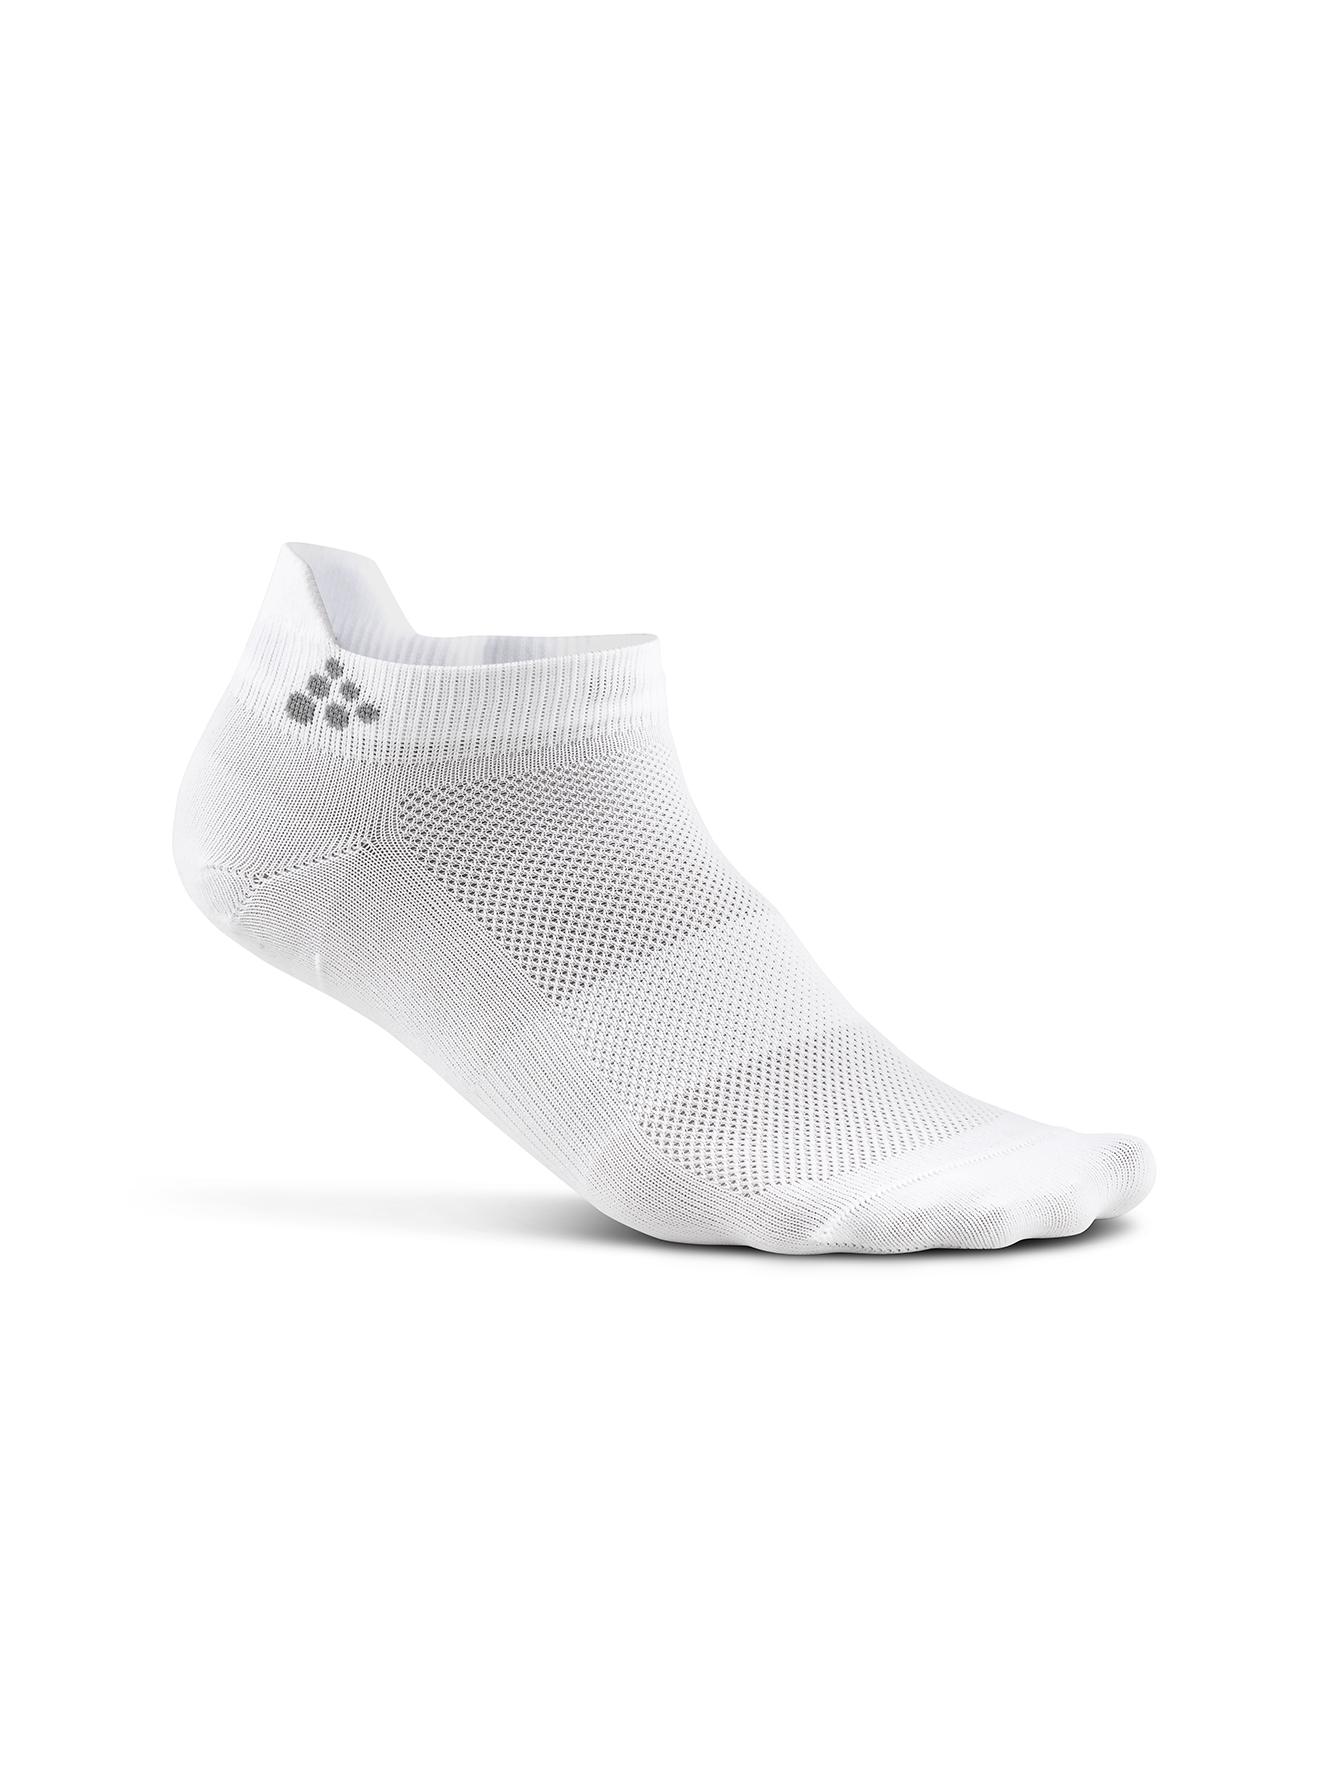 Ponožky CRAFT Shaftless 3-pack 682bc46784